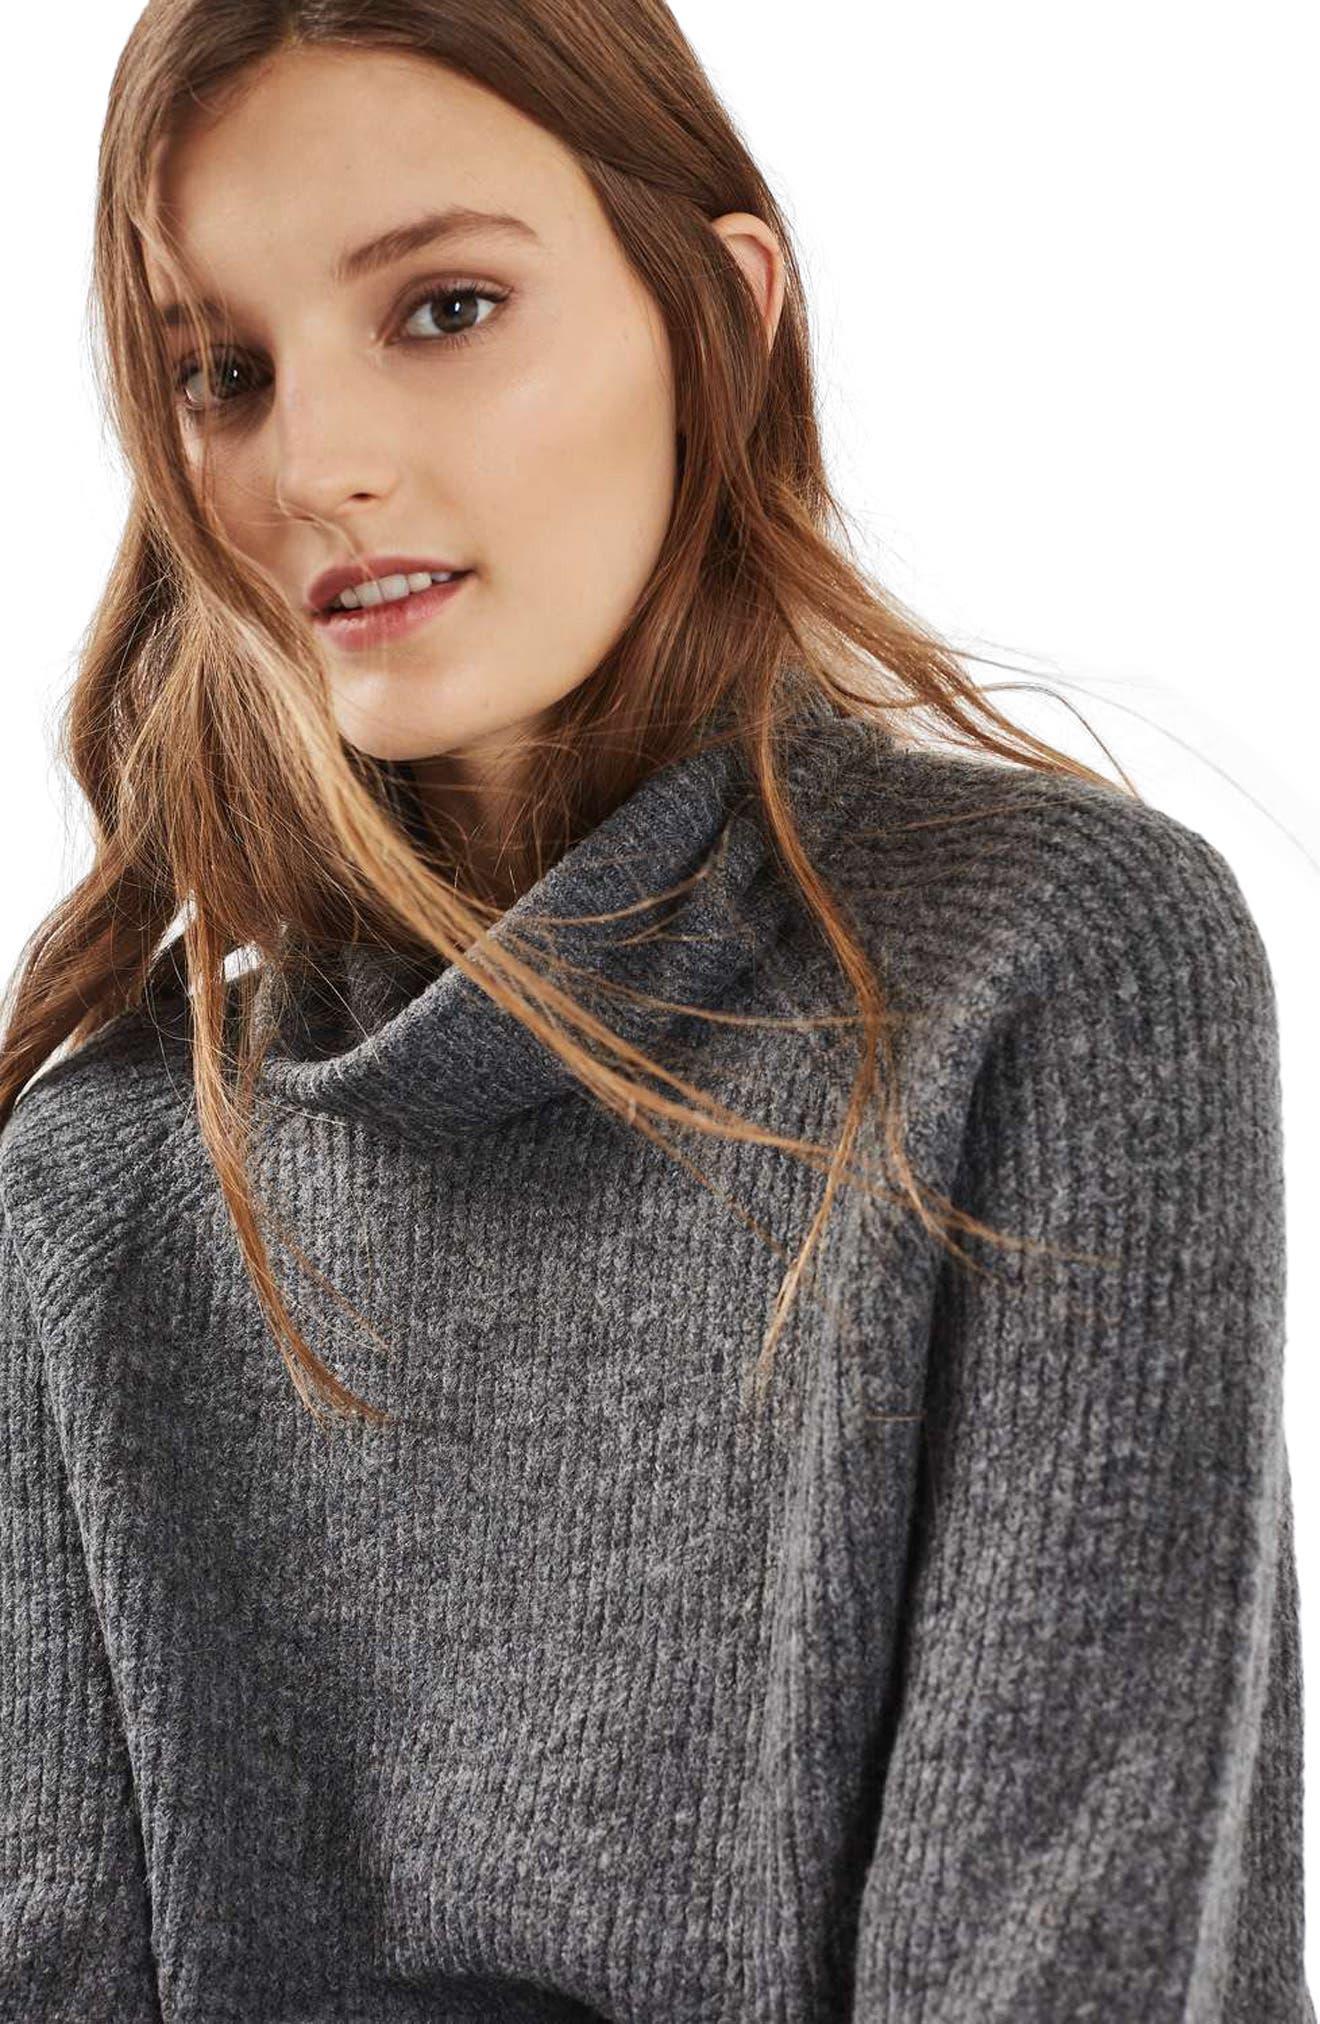 TOPSHOP,                             Oversize Turtleneck Sweater,                             Alternate thumbnail 2, color,                             021